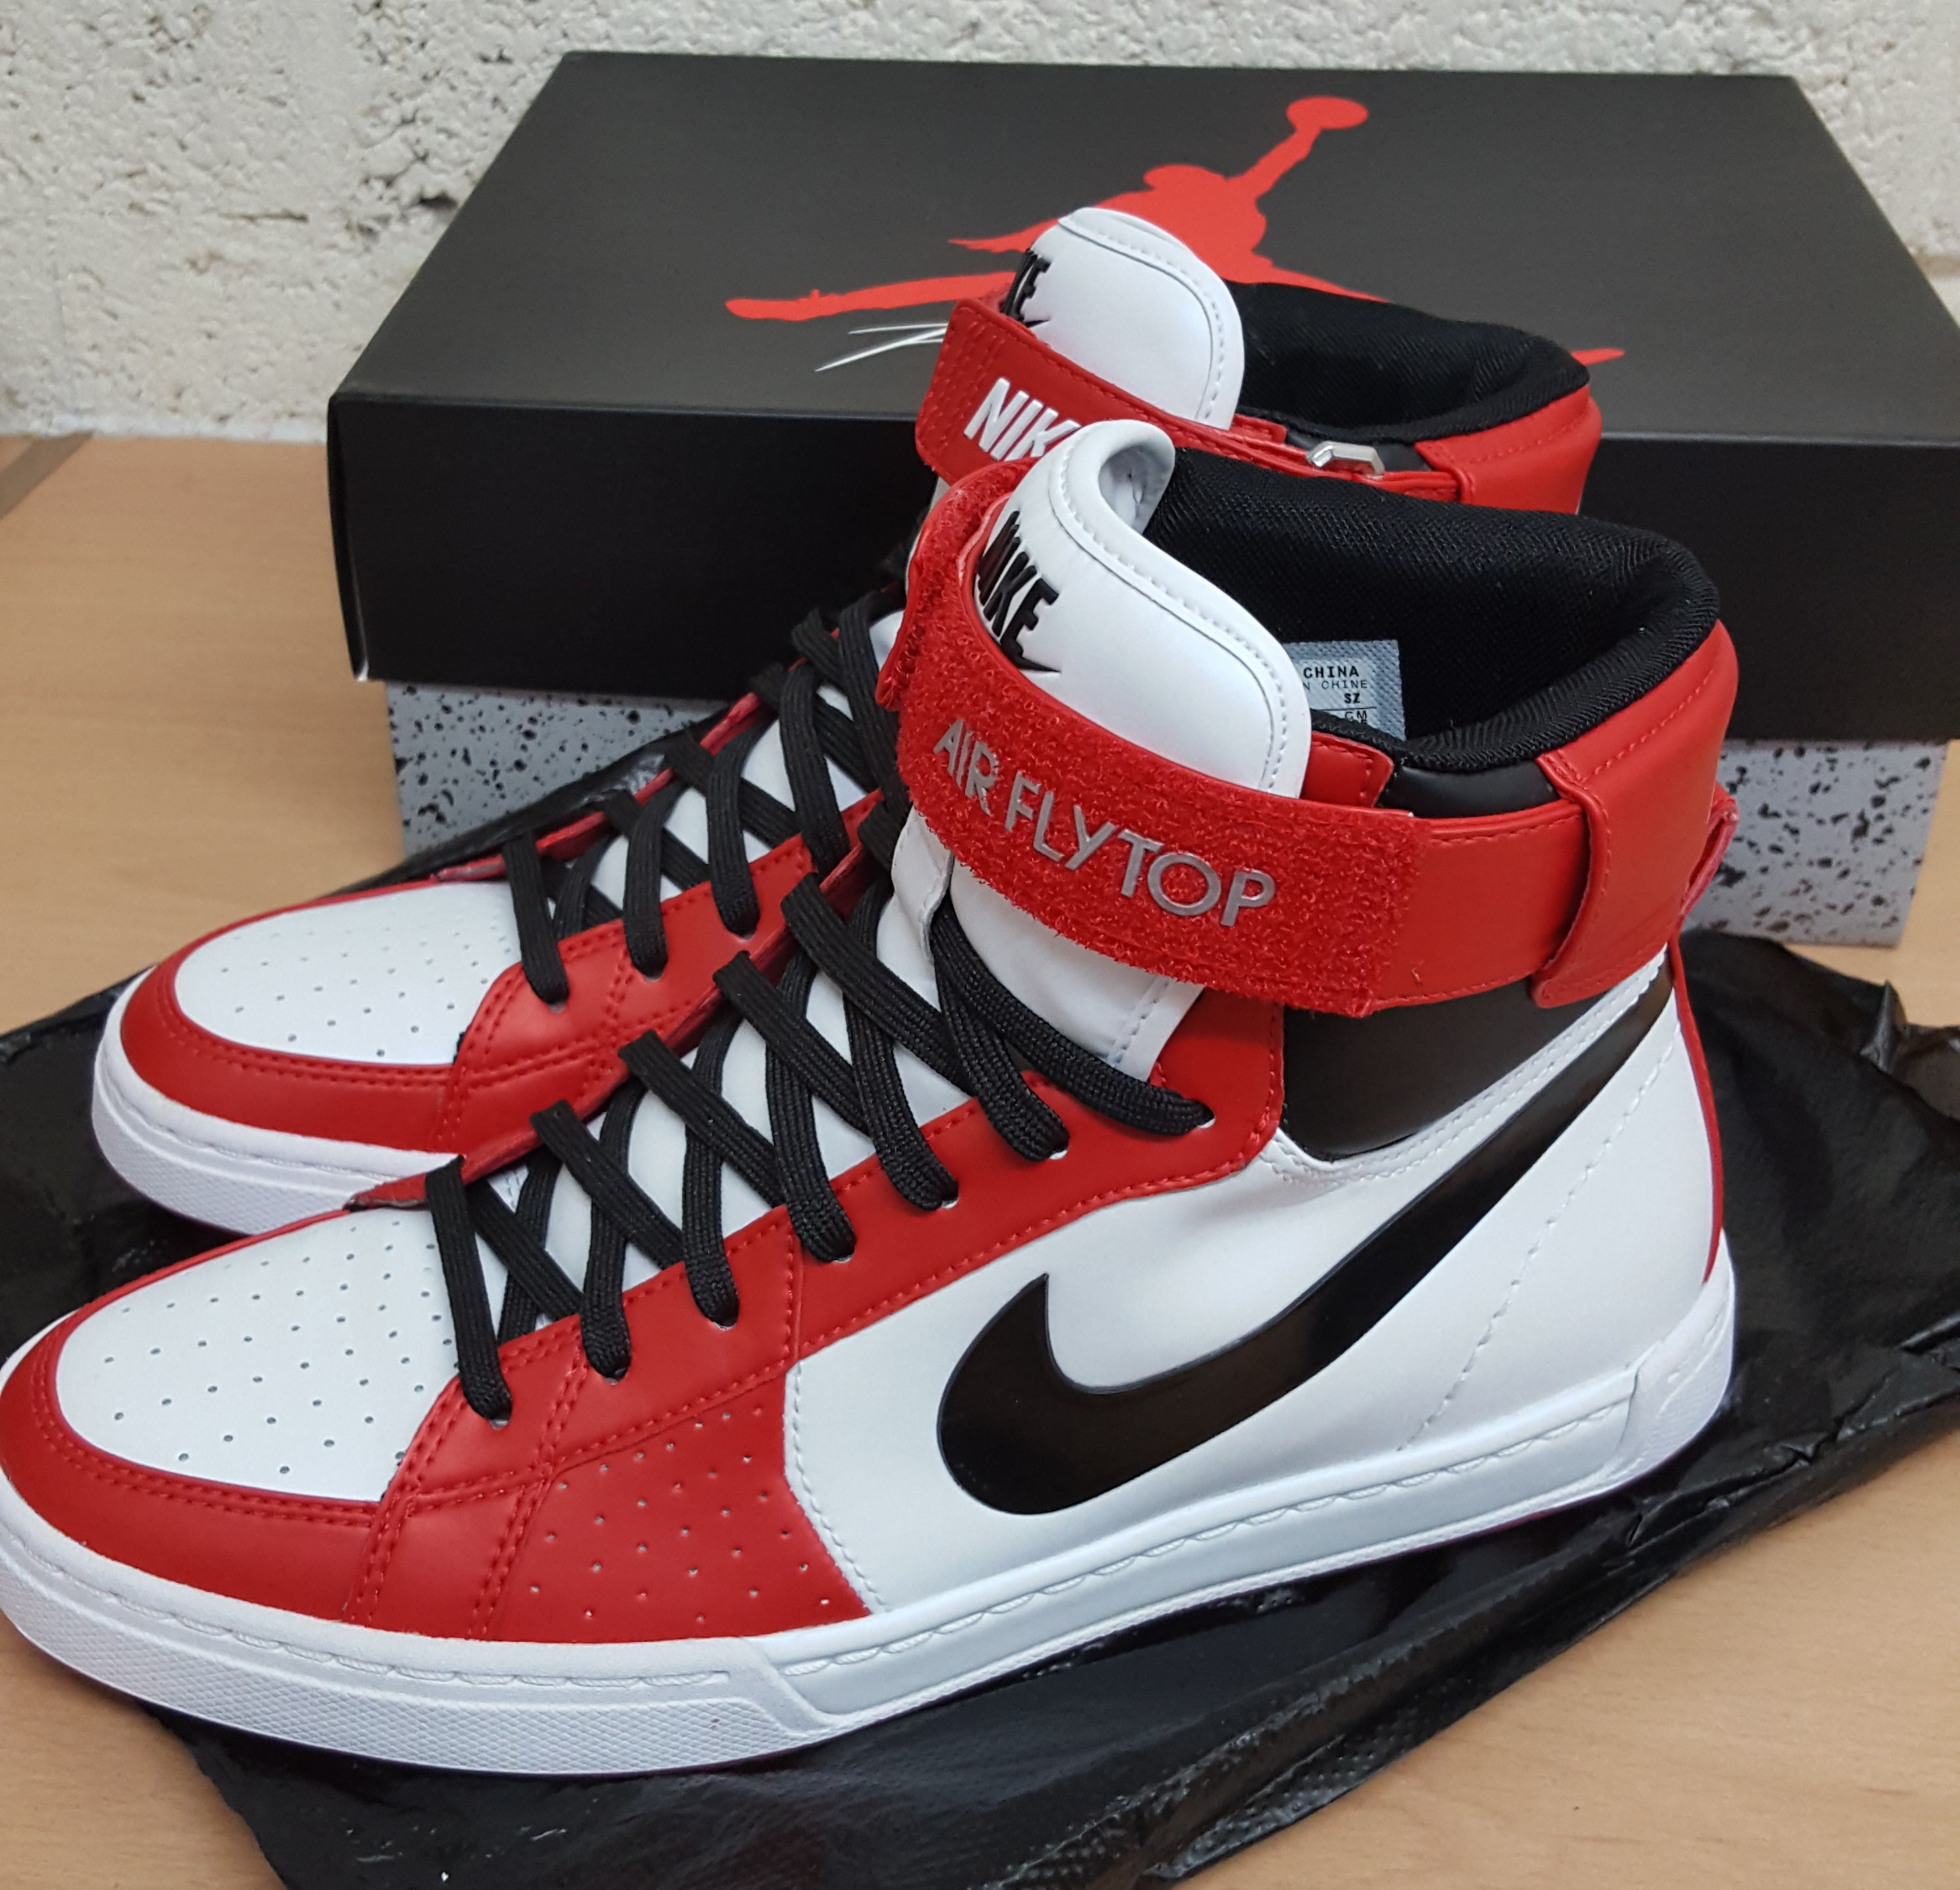 Nike Air Flytop - 385225-103 - UK SIZE 7